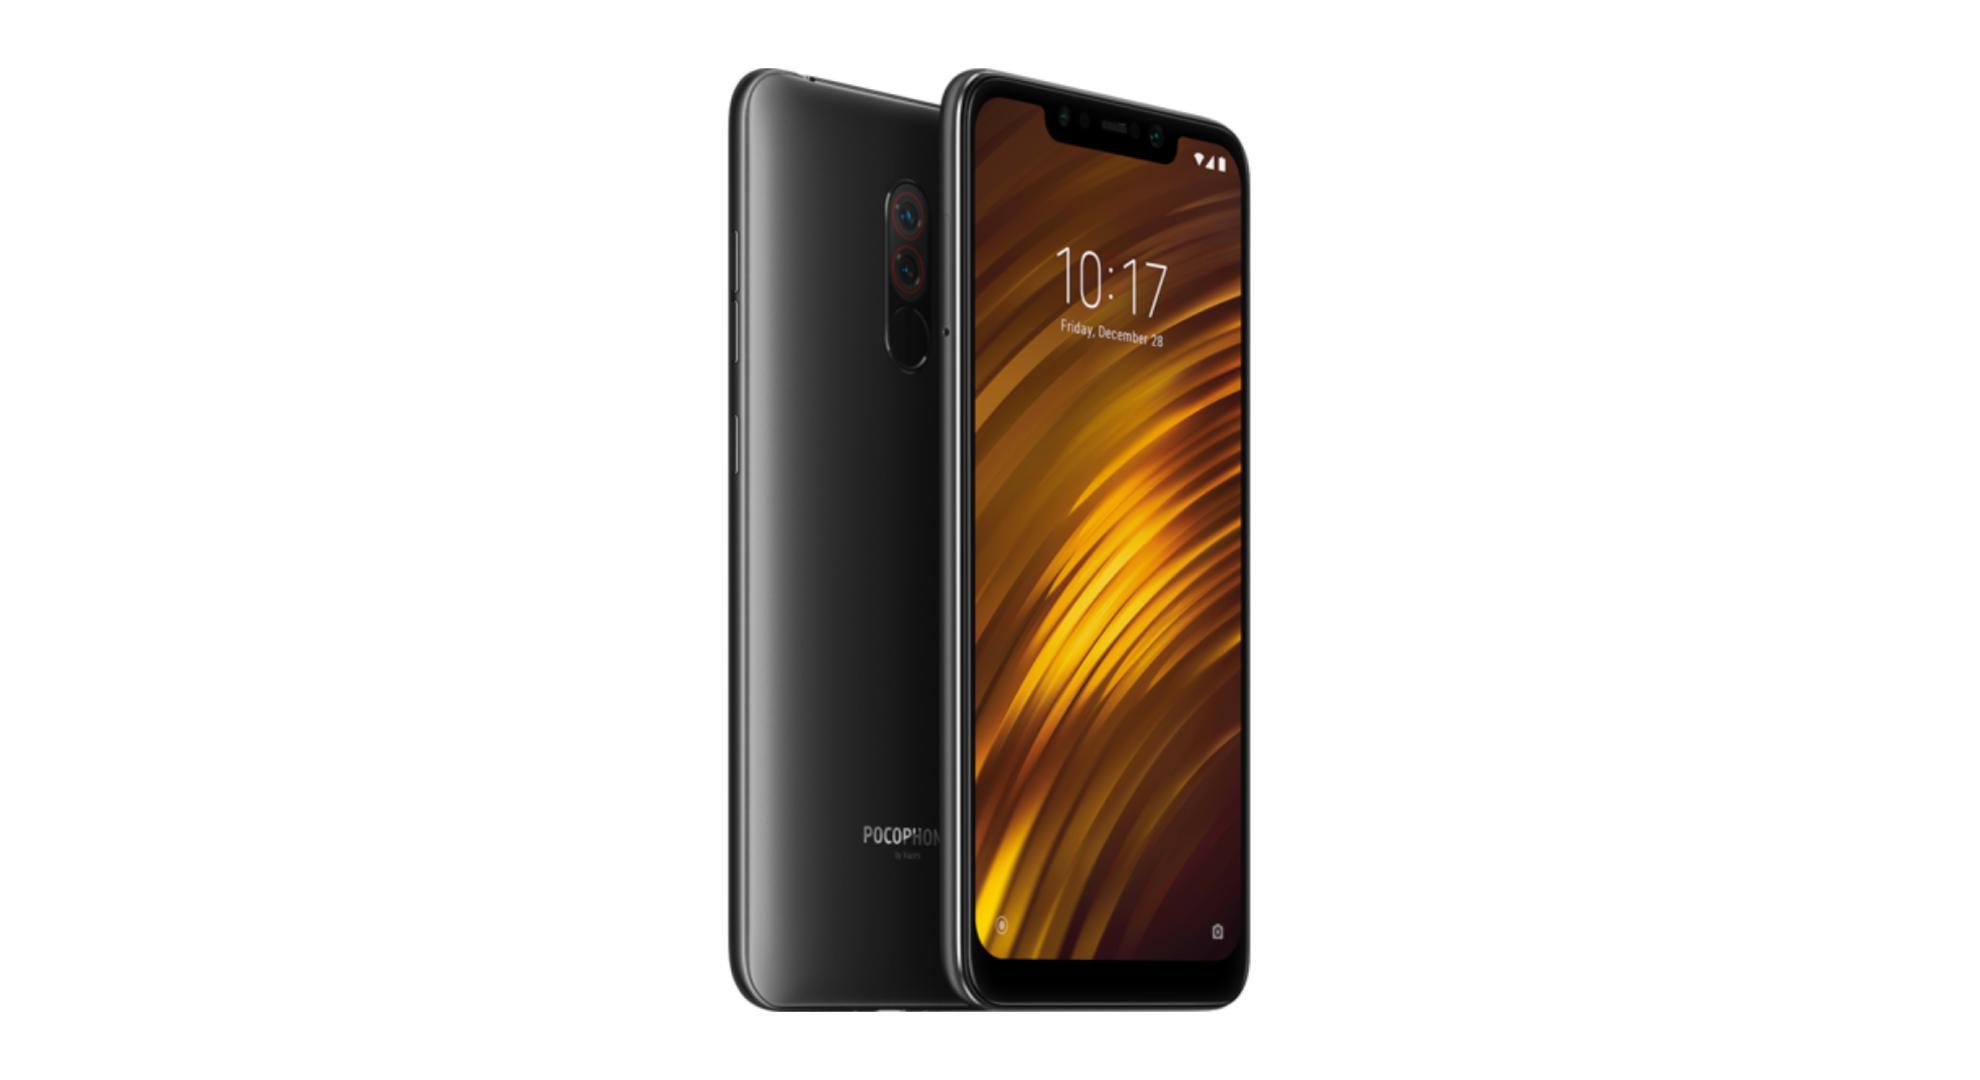 🔥 Bon plan : le Xiaomi Pocophone F1 (Snapdragon 845) passe à 258 euros